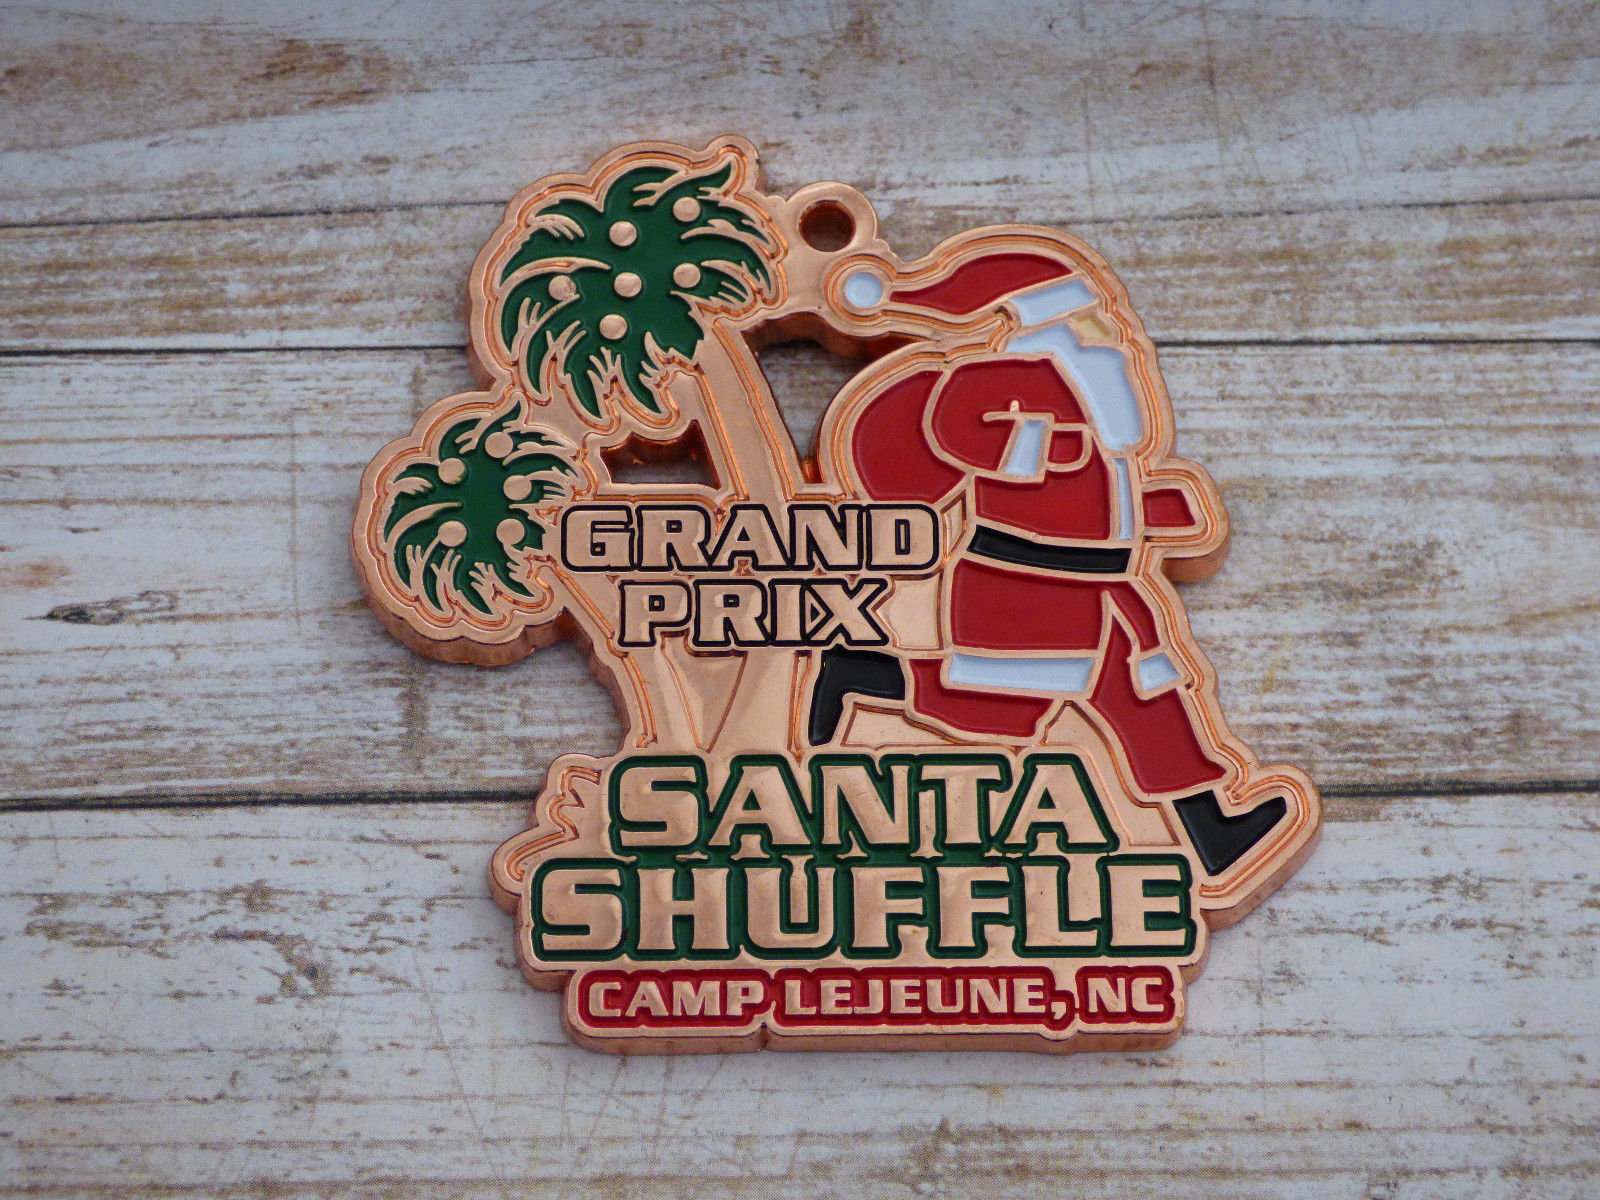 Marine Corps Camp Lejune Santa Shuffle Grand Prix Medallion